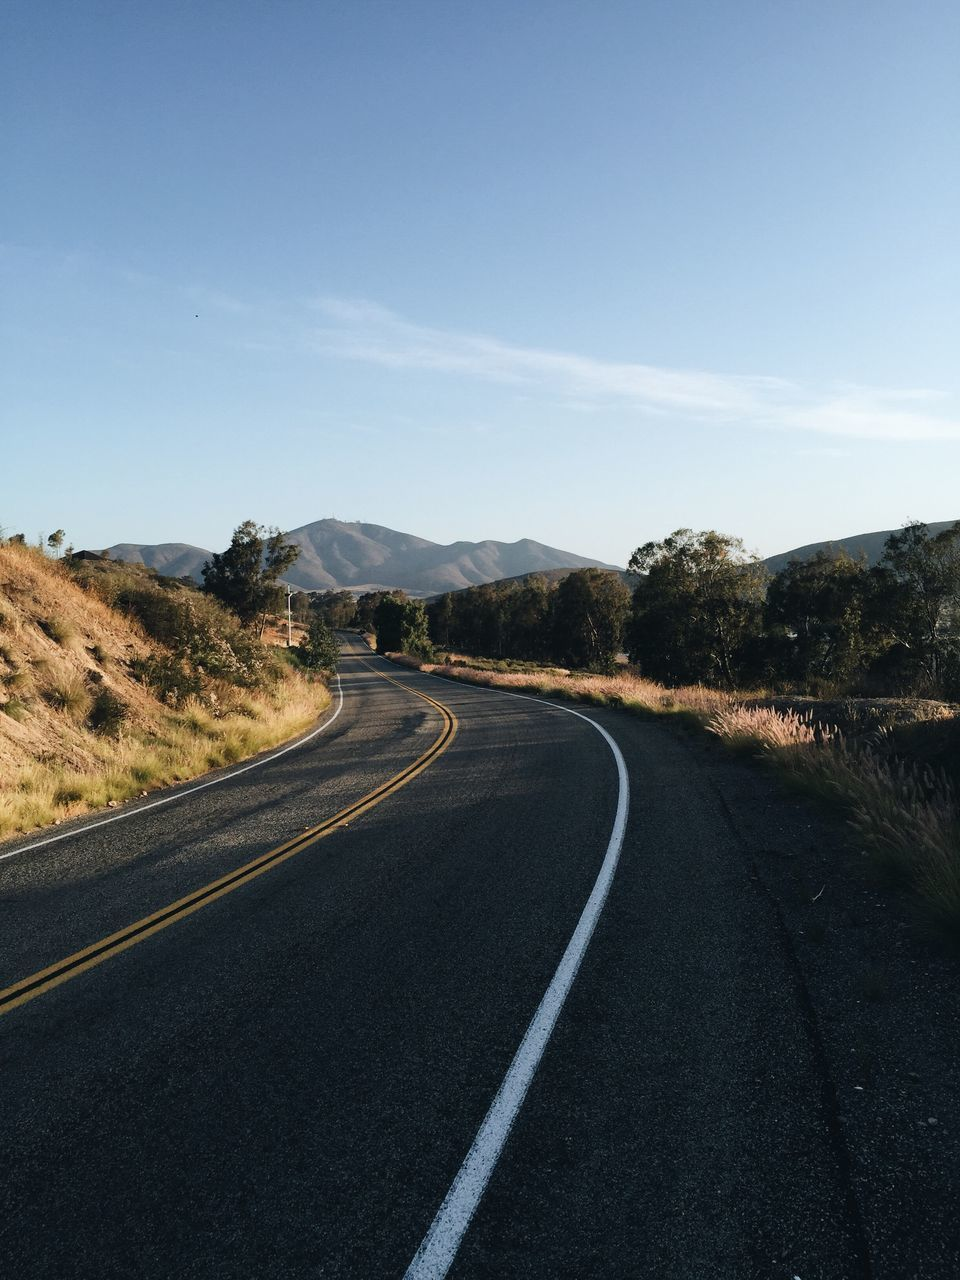 Empty Road Leading Towards Mountain